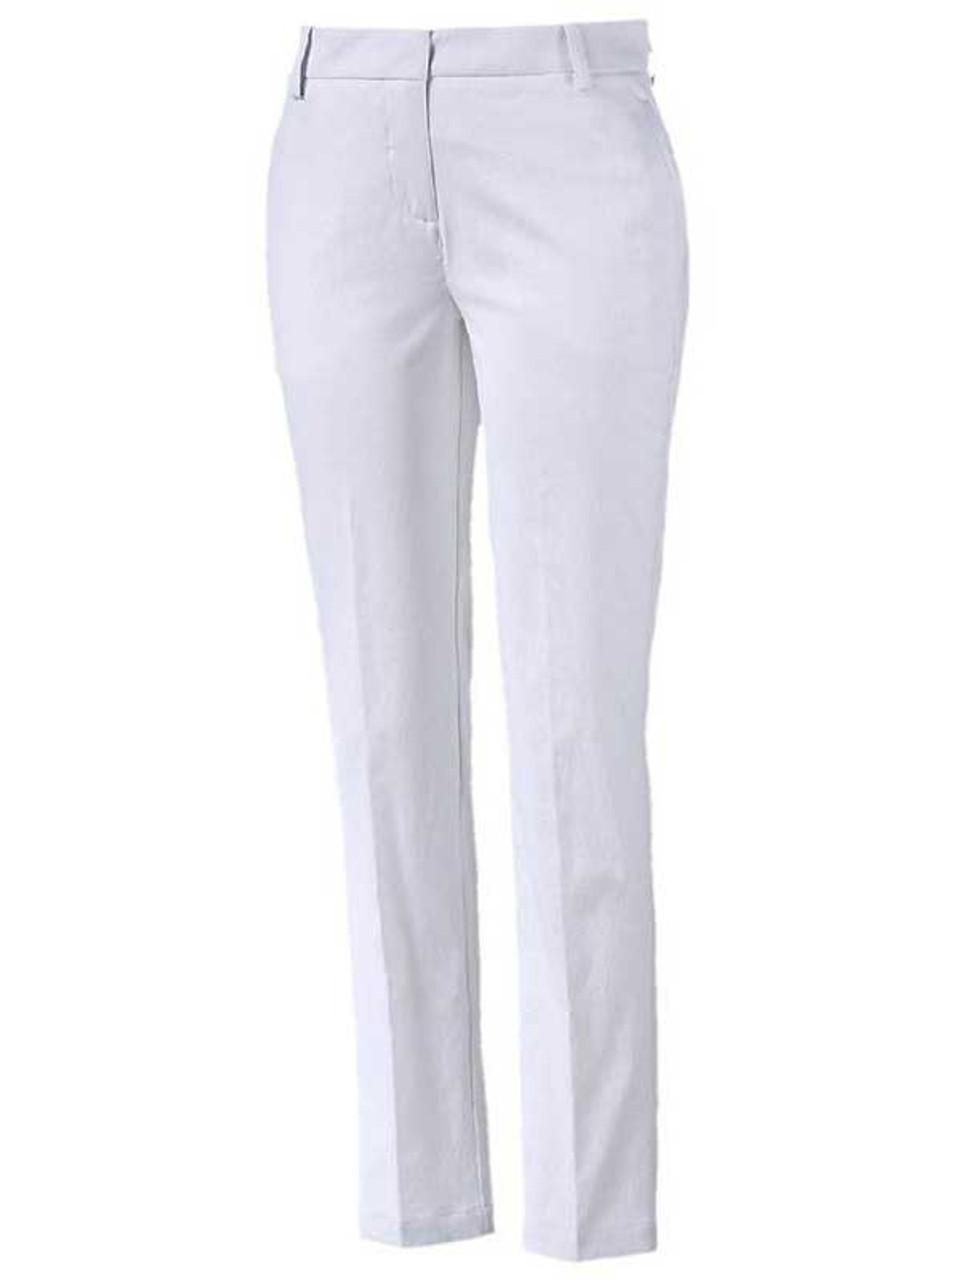 8206ffc600c9 Puma W Pounce Pant - White - Ladies For Sale